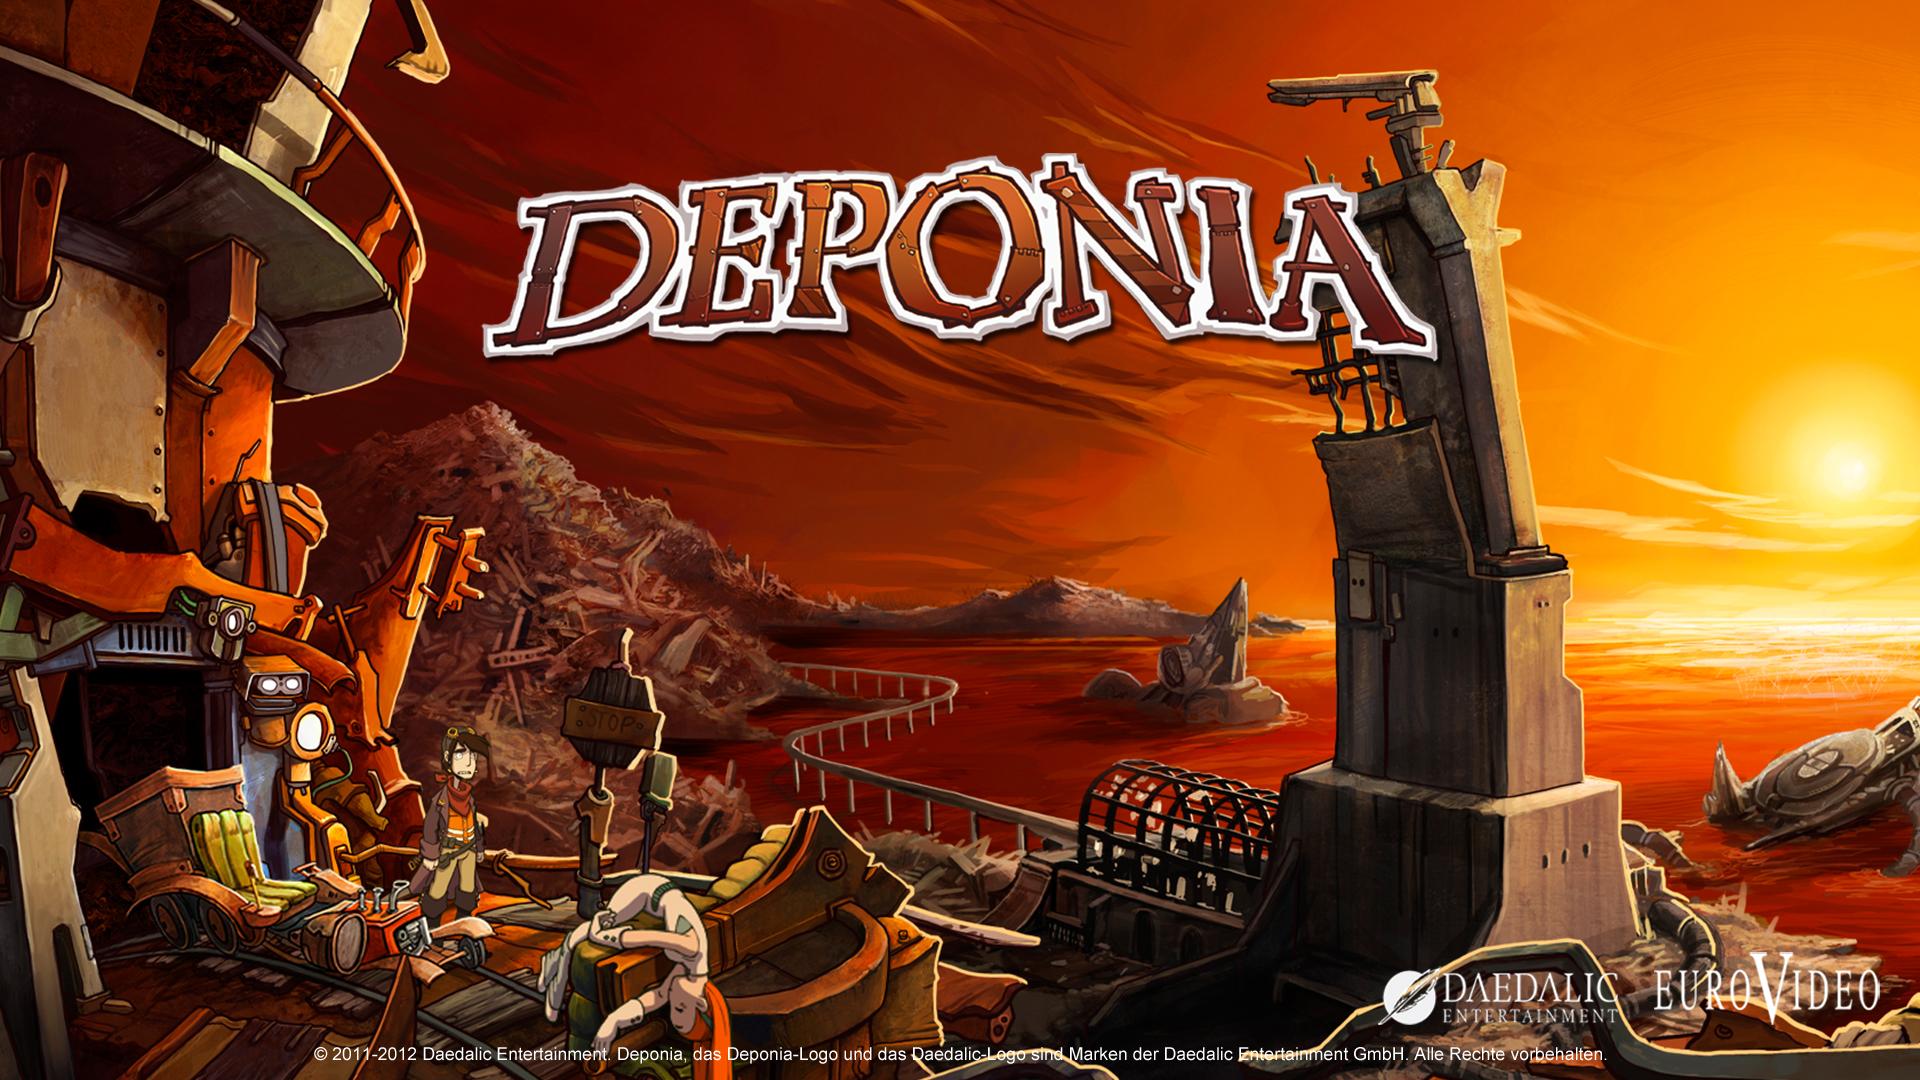 Deponia 2